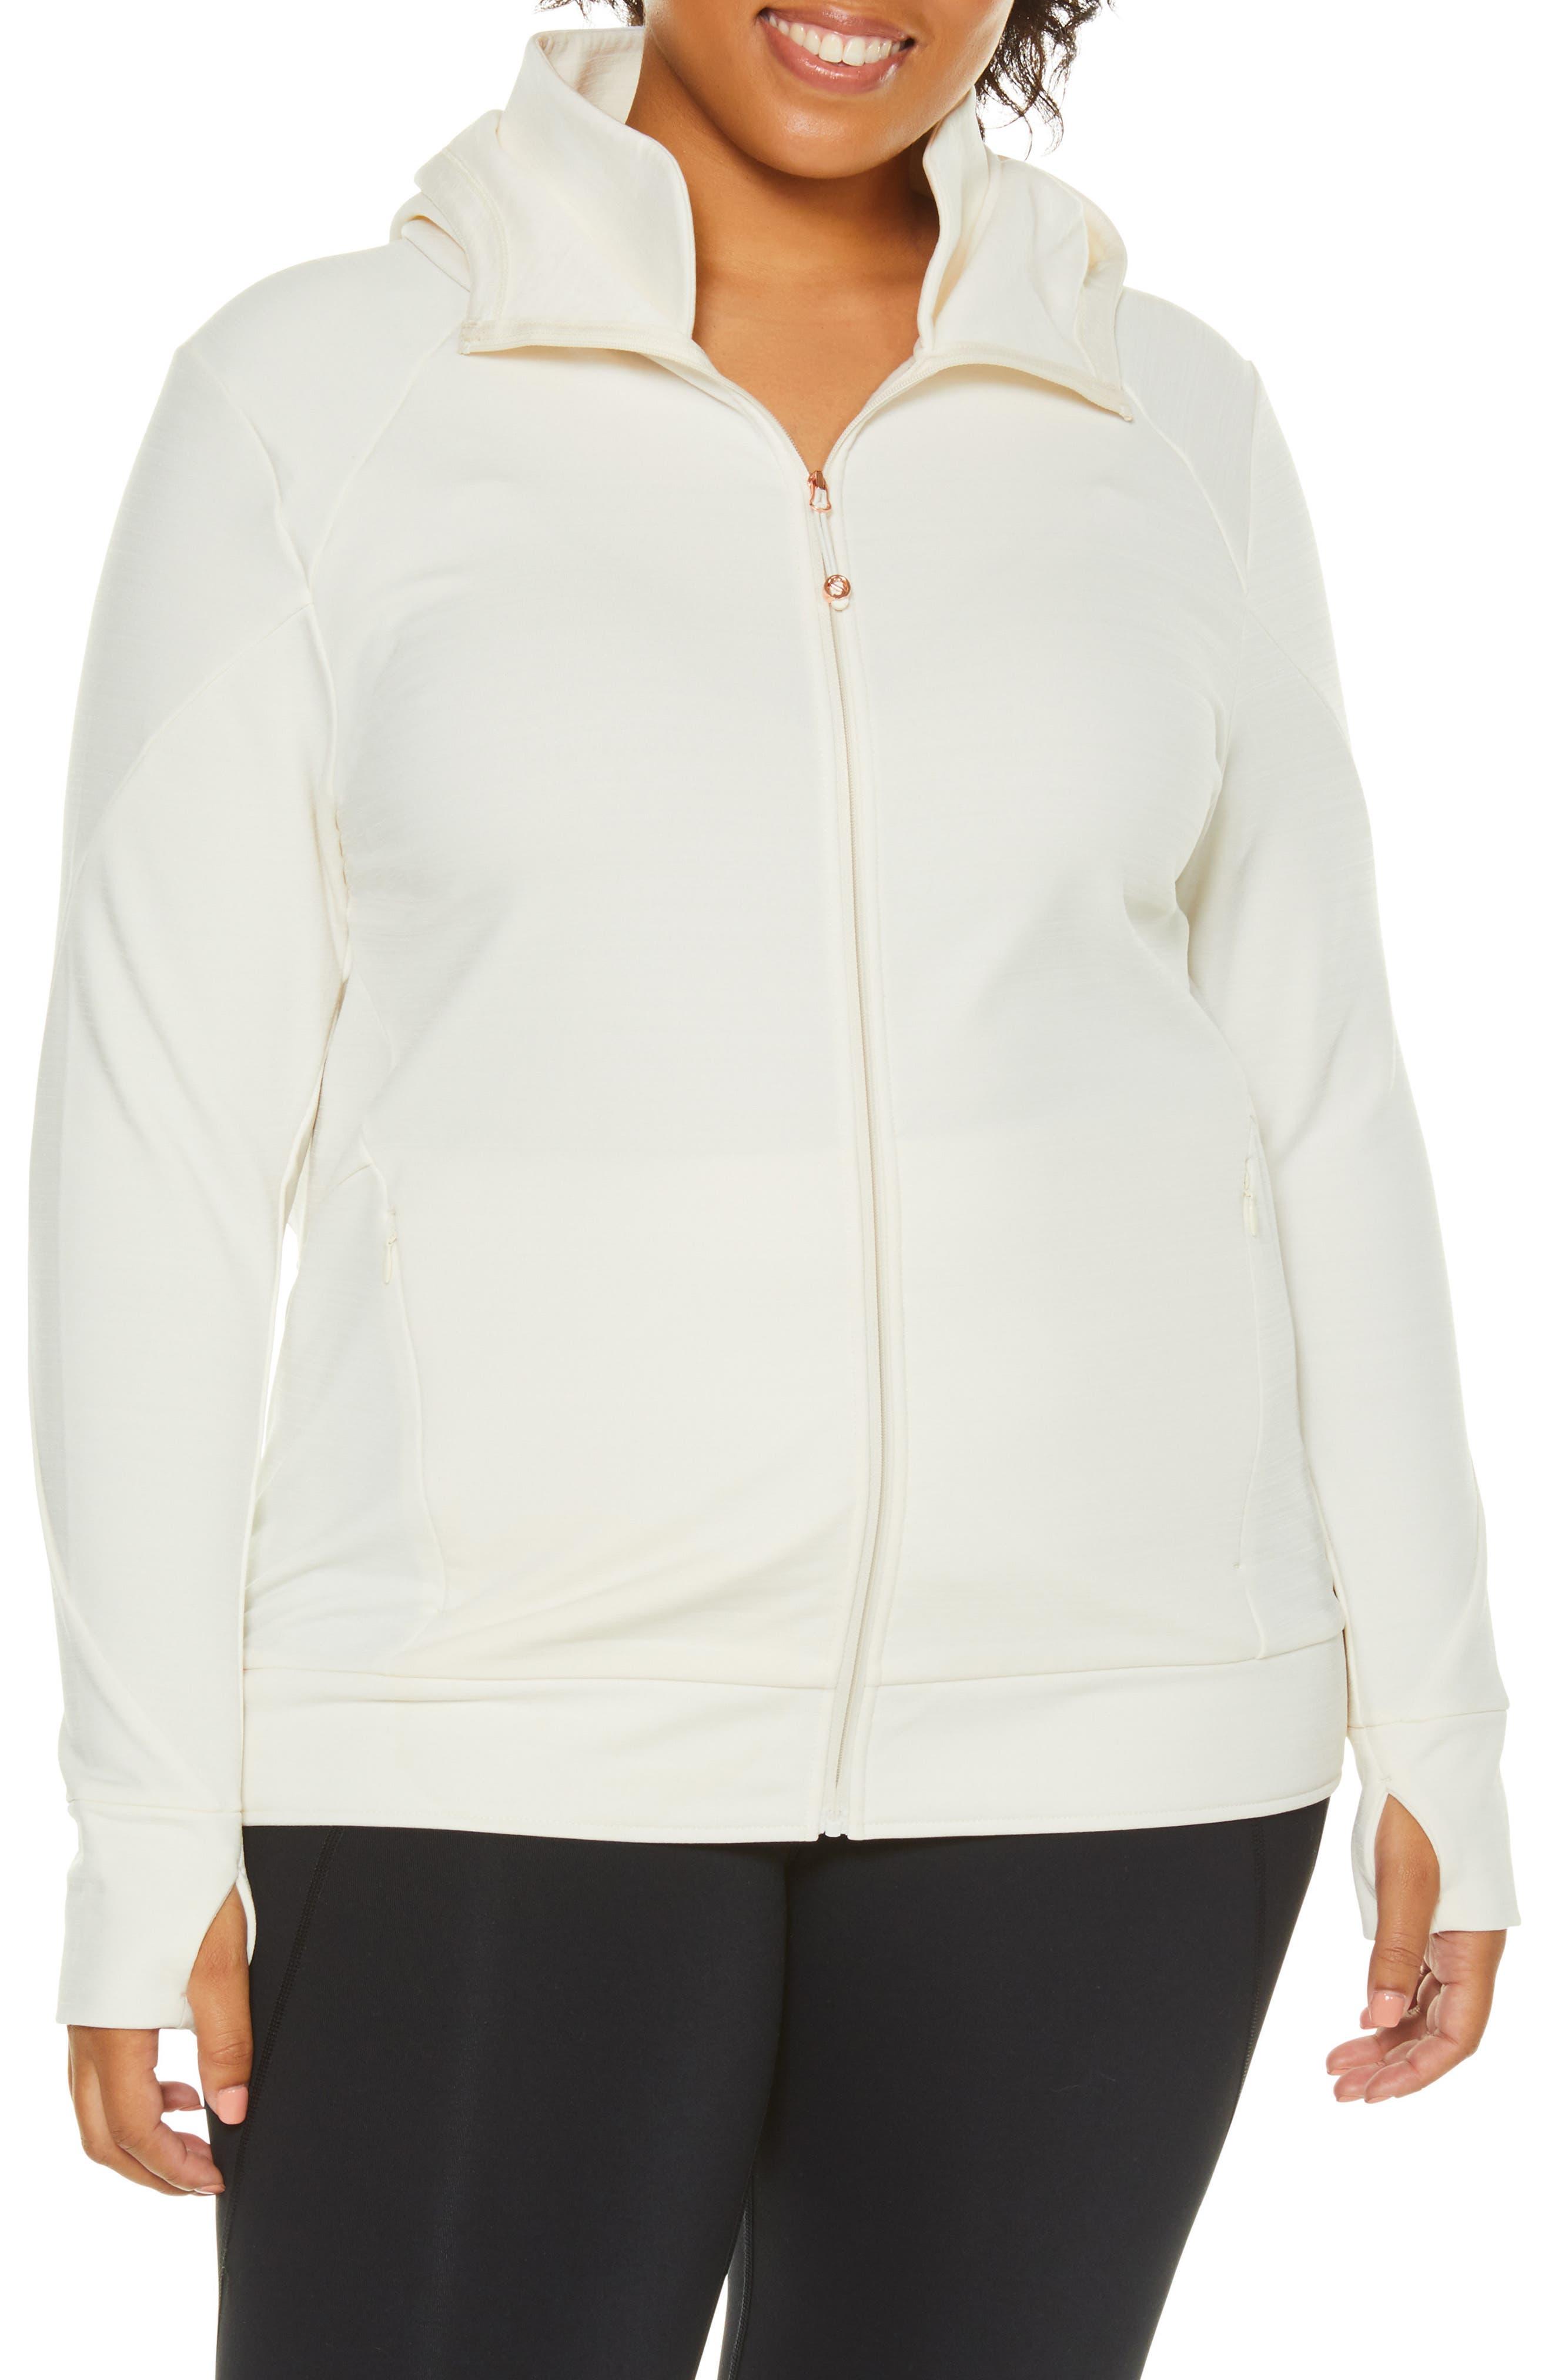 Plus Size Shape Activewear Elements Hoodie, White